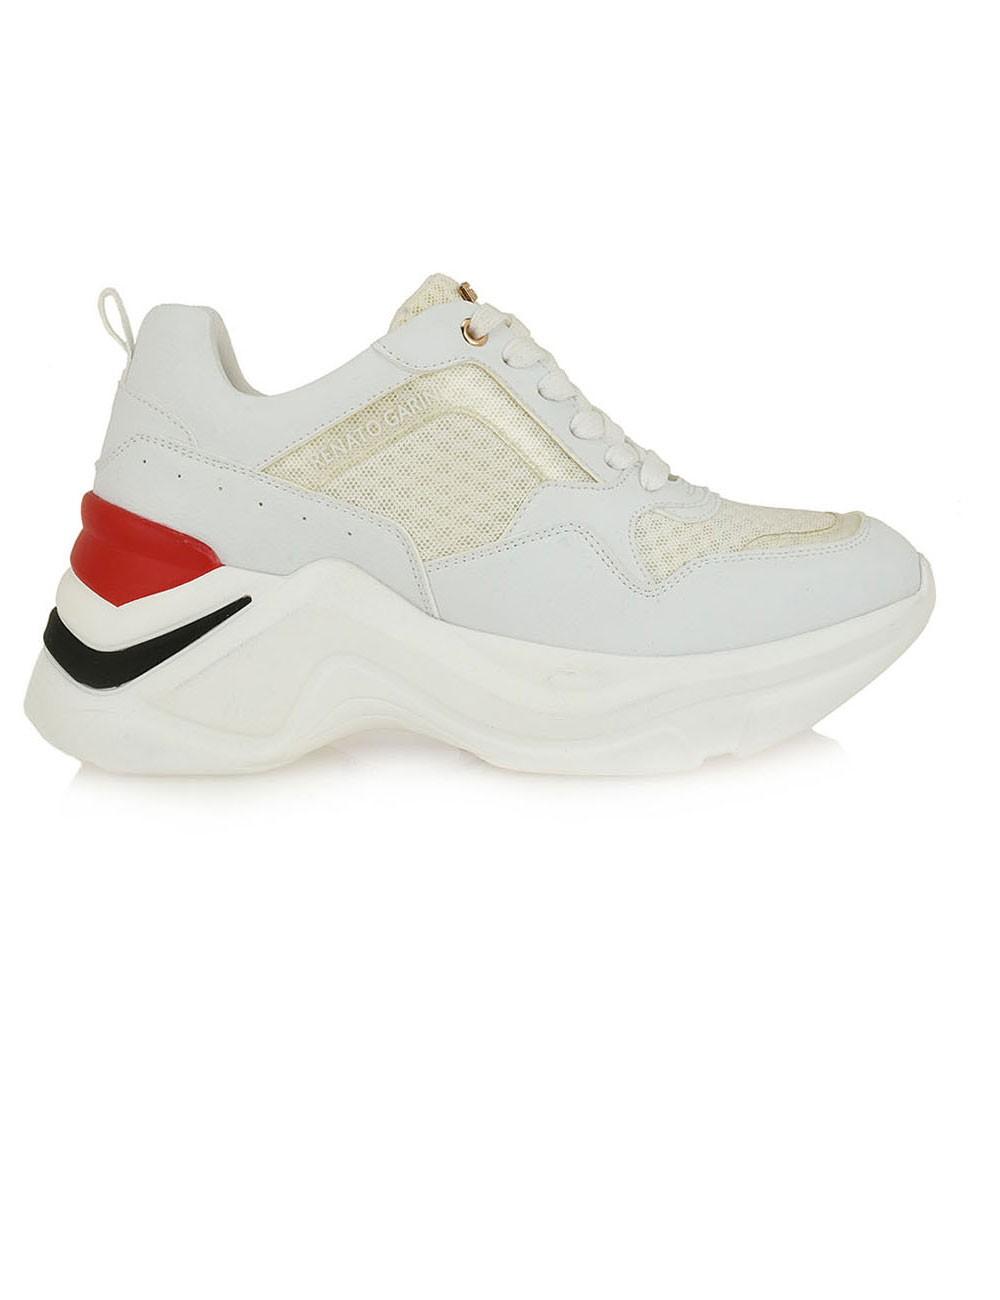 Renato Garini Γυναικεία Παπούτσια Sneakers 617-19R Λευκό- Κόκκινο N119R6173097